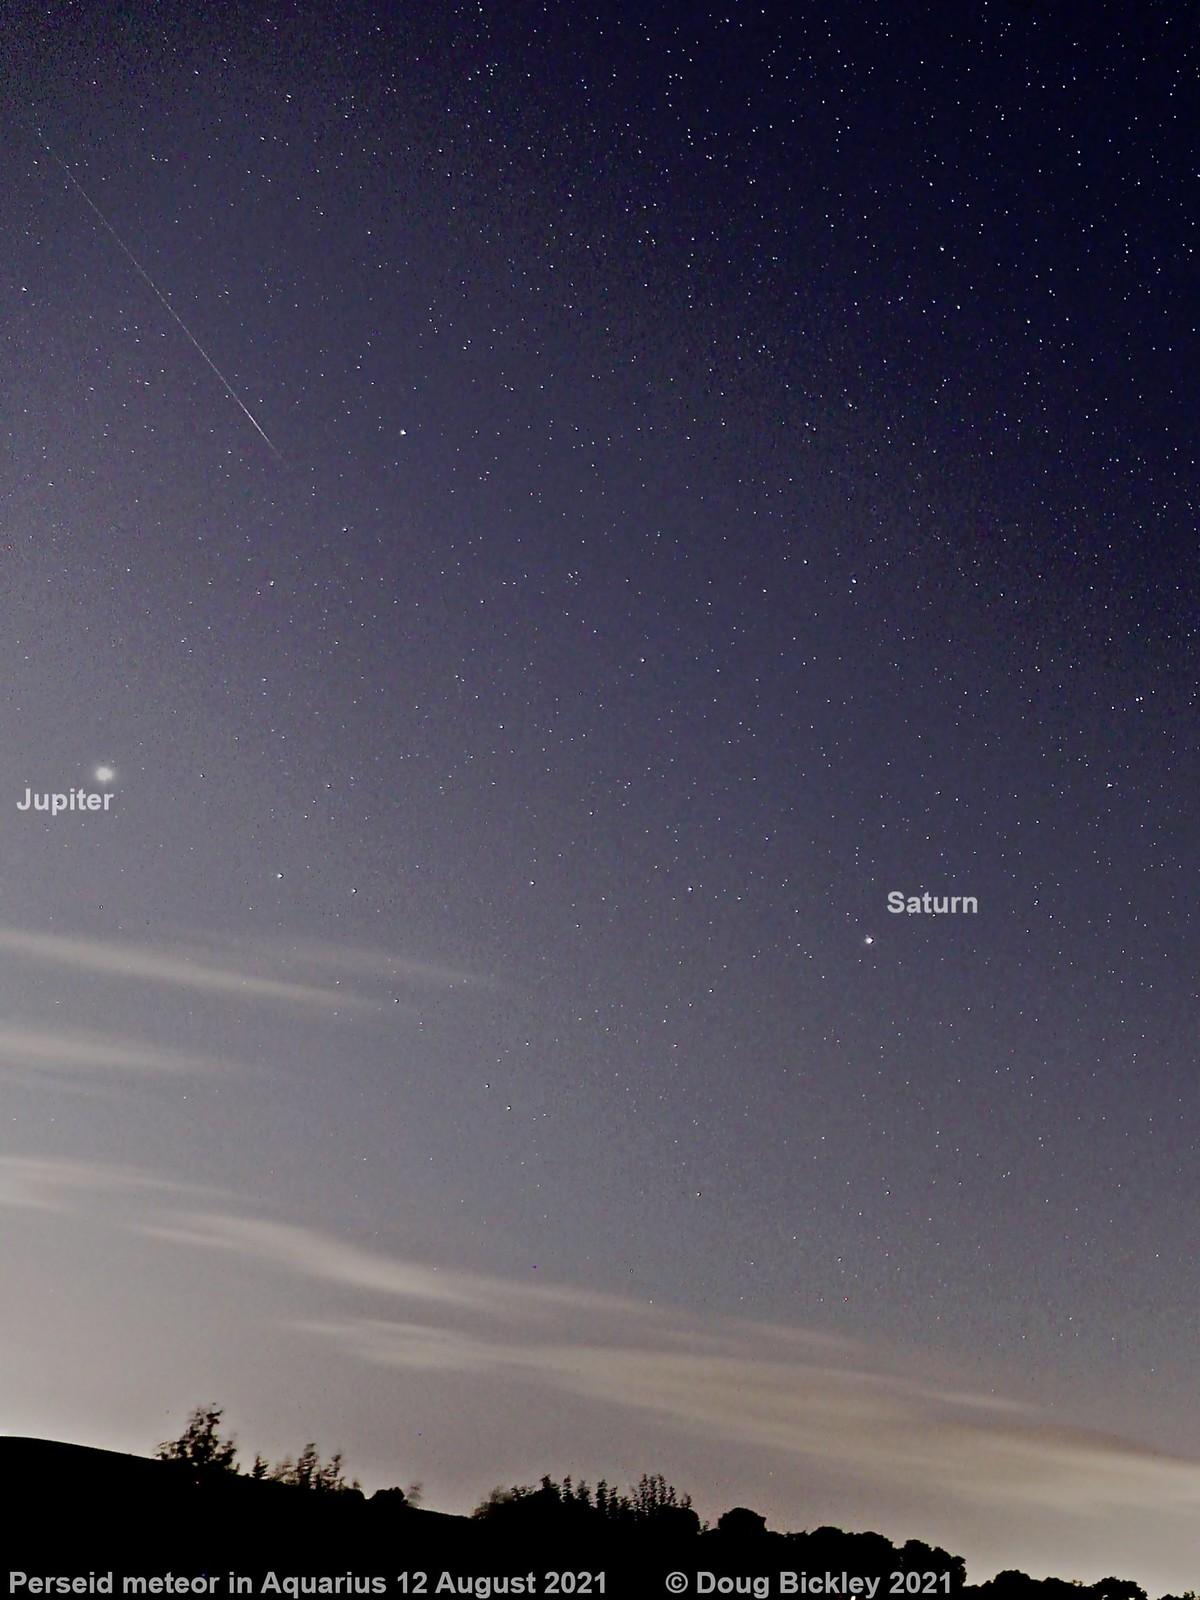 Perseid meteor 12 Aug 2021 in Aquarius